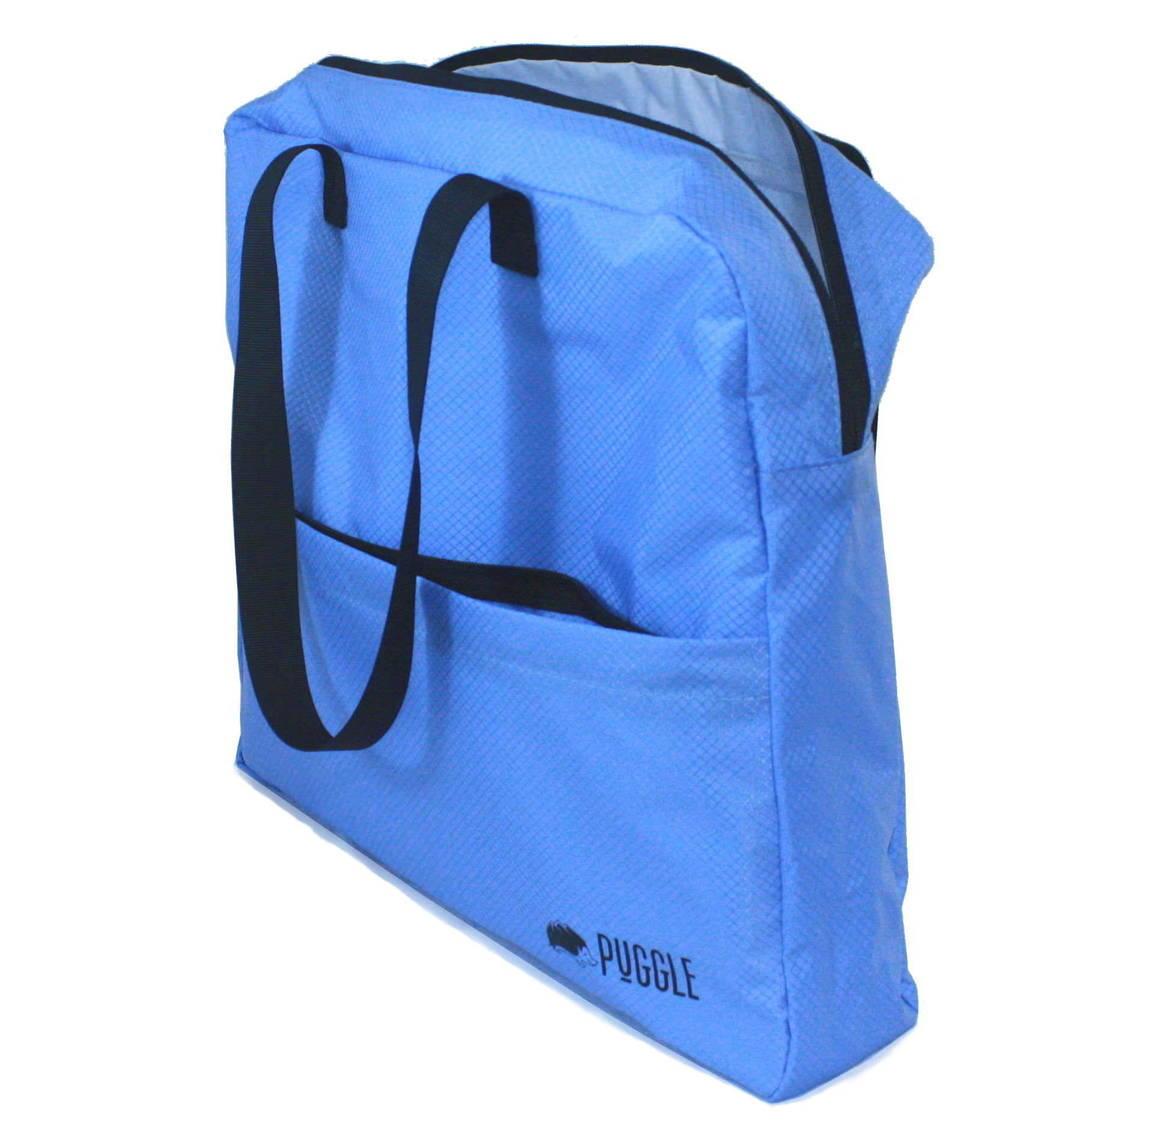 Eco-Friendly Wet/Dry Beach Bag | Trada Marketplace